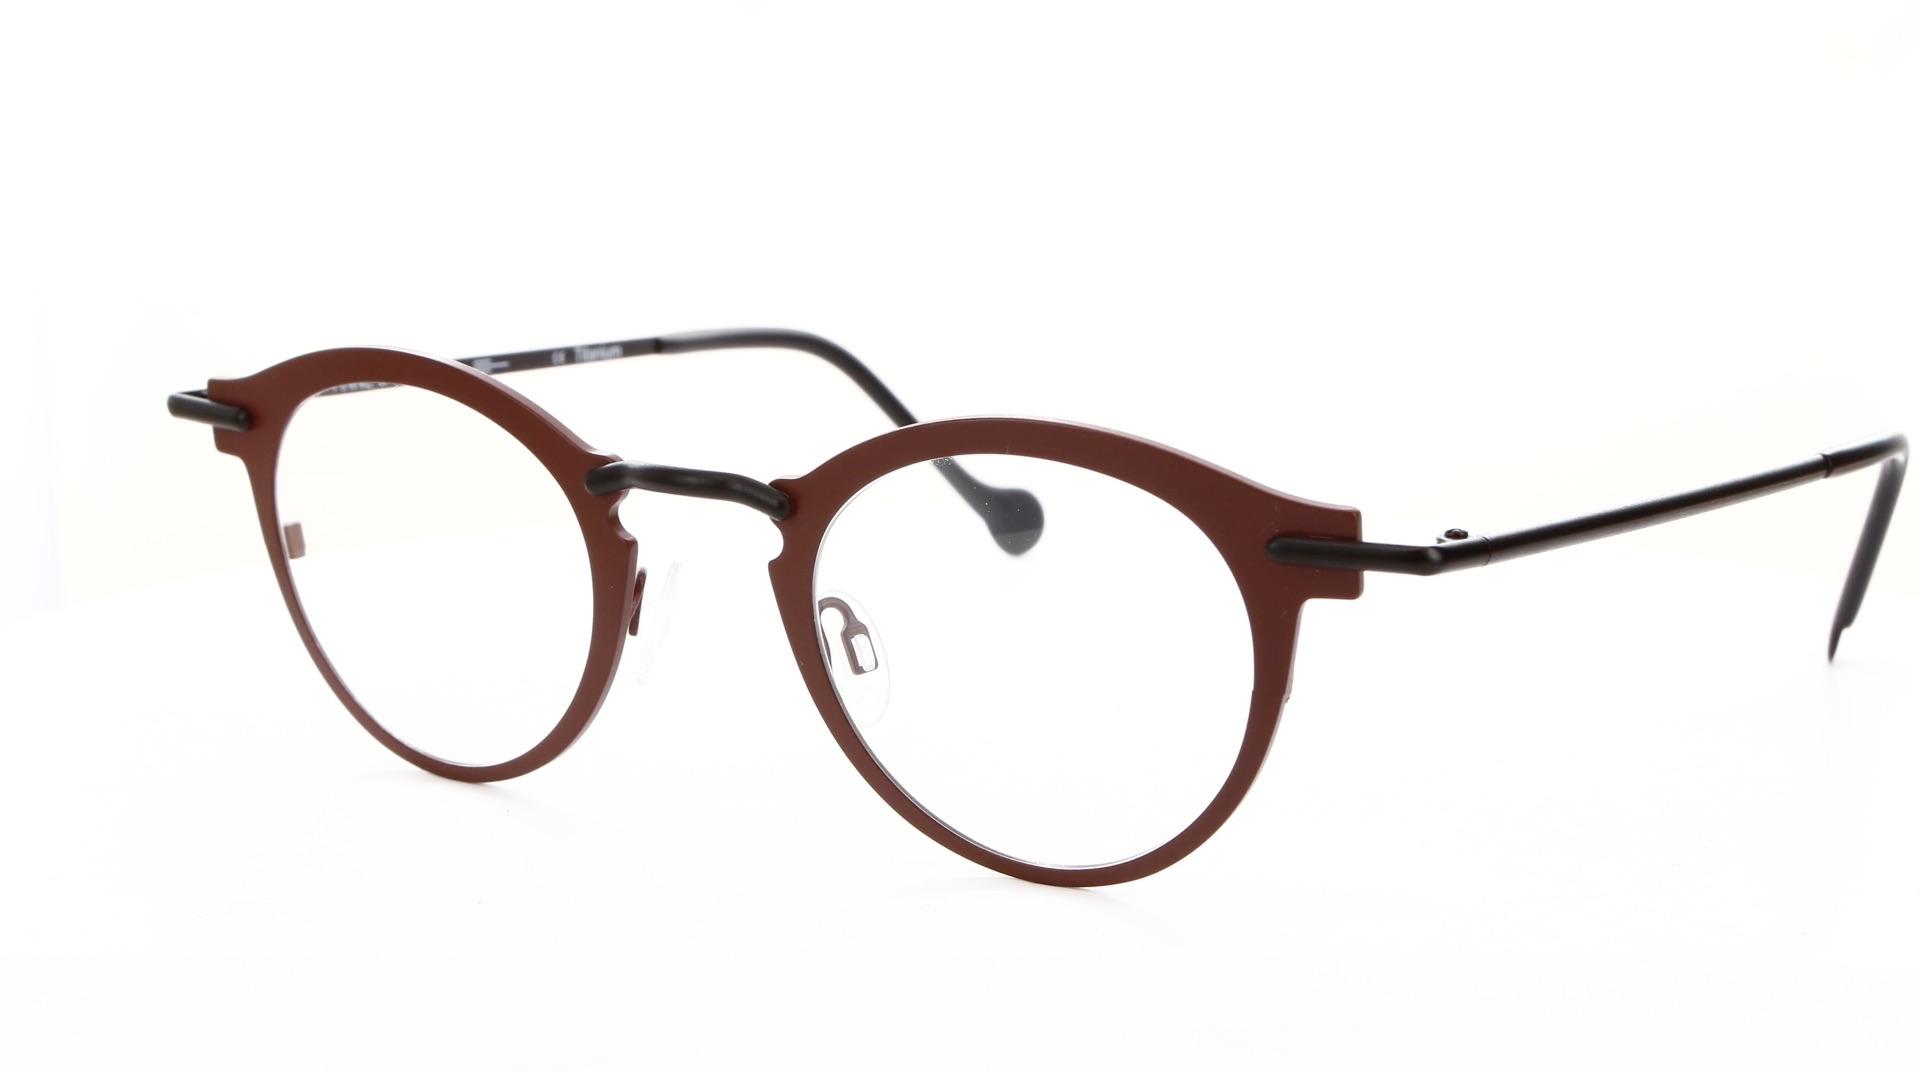 78463 | Anne et Valentin Frames | Claeyssens Optic | Brugge & Gent